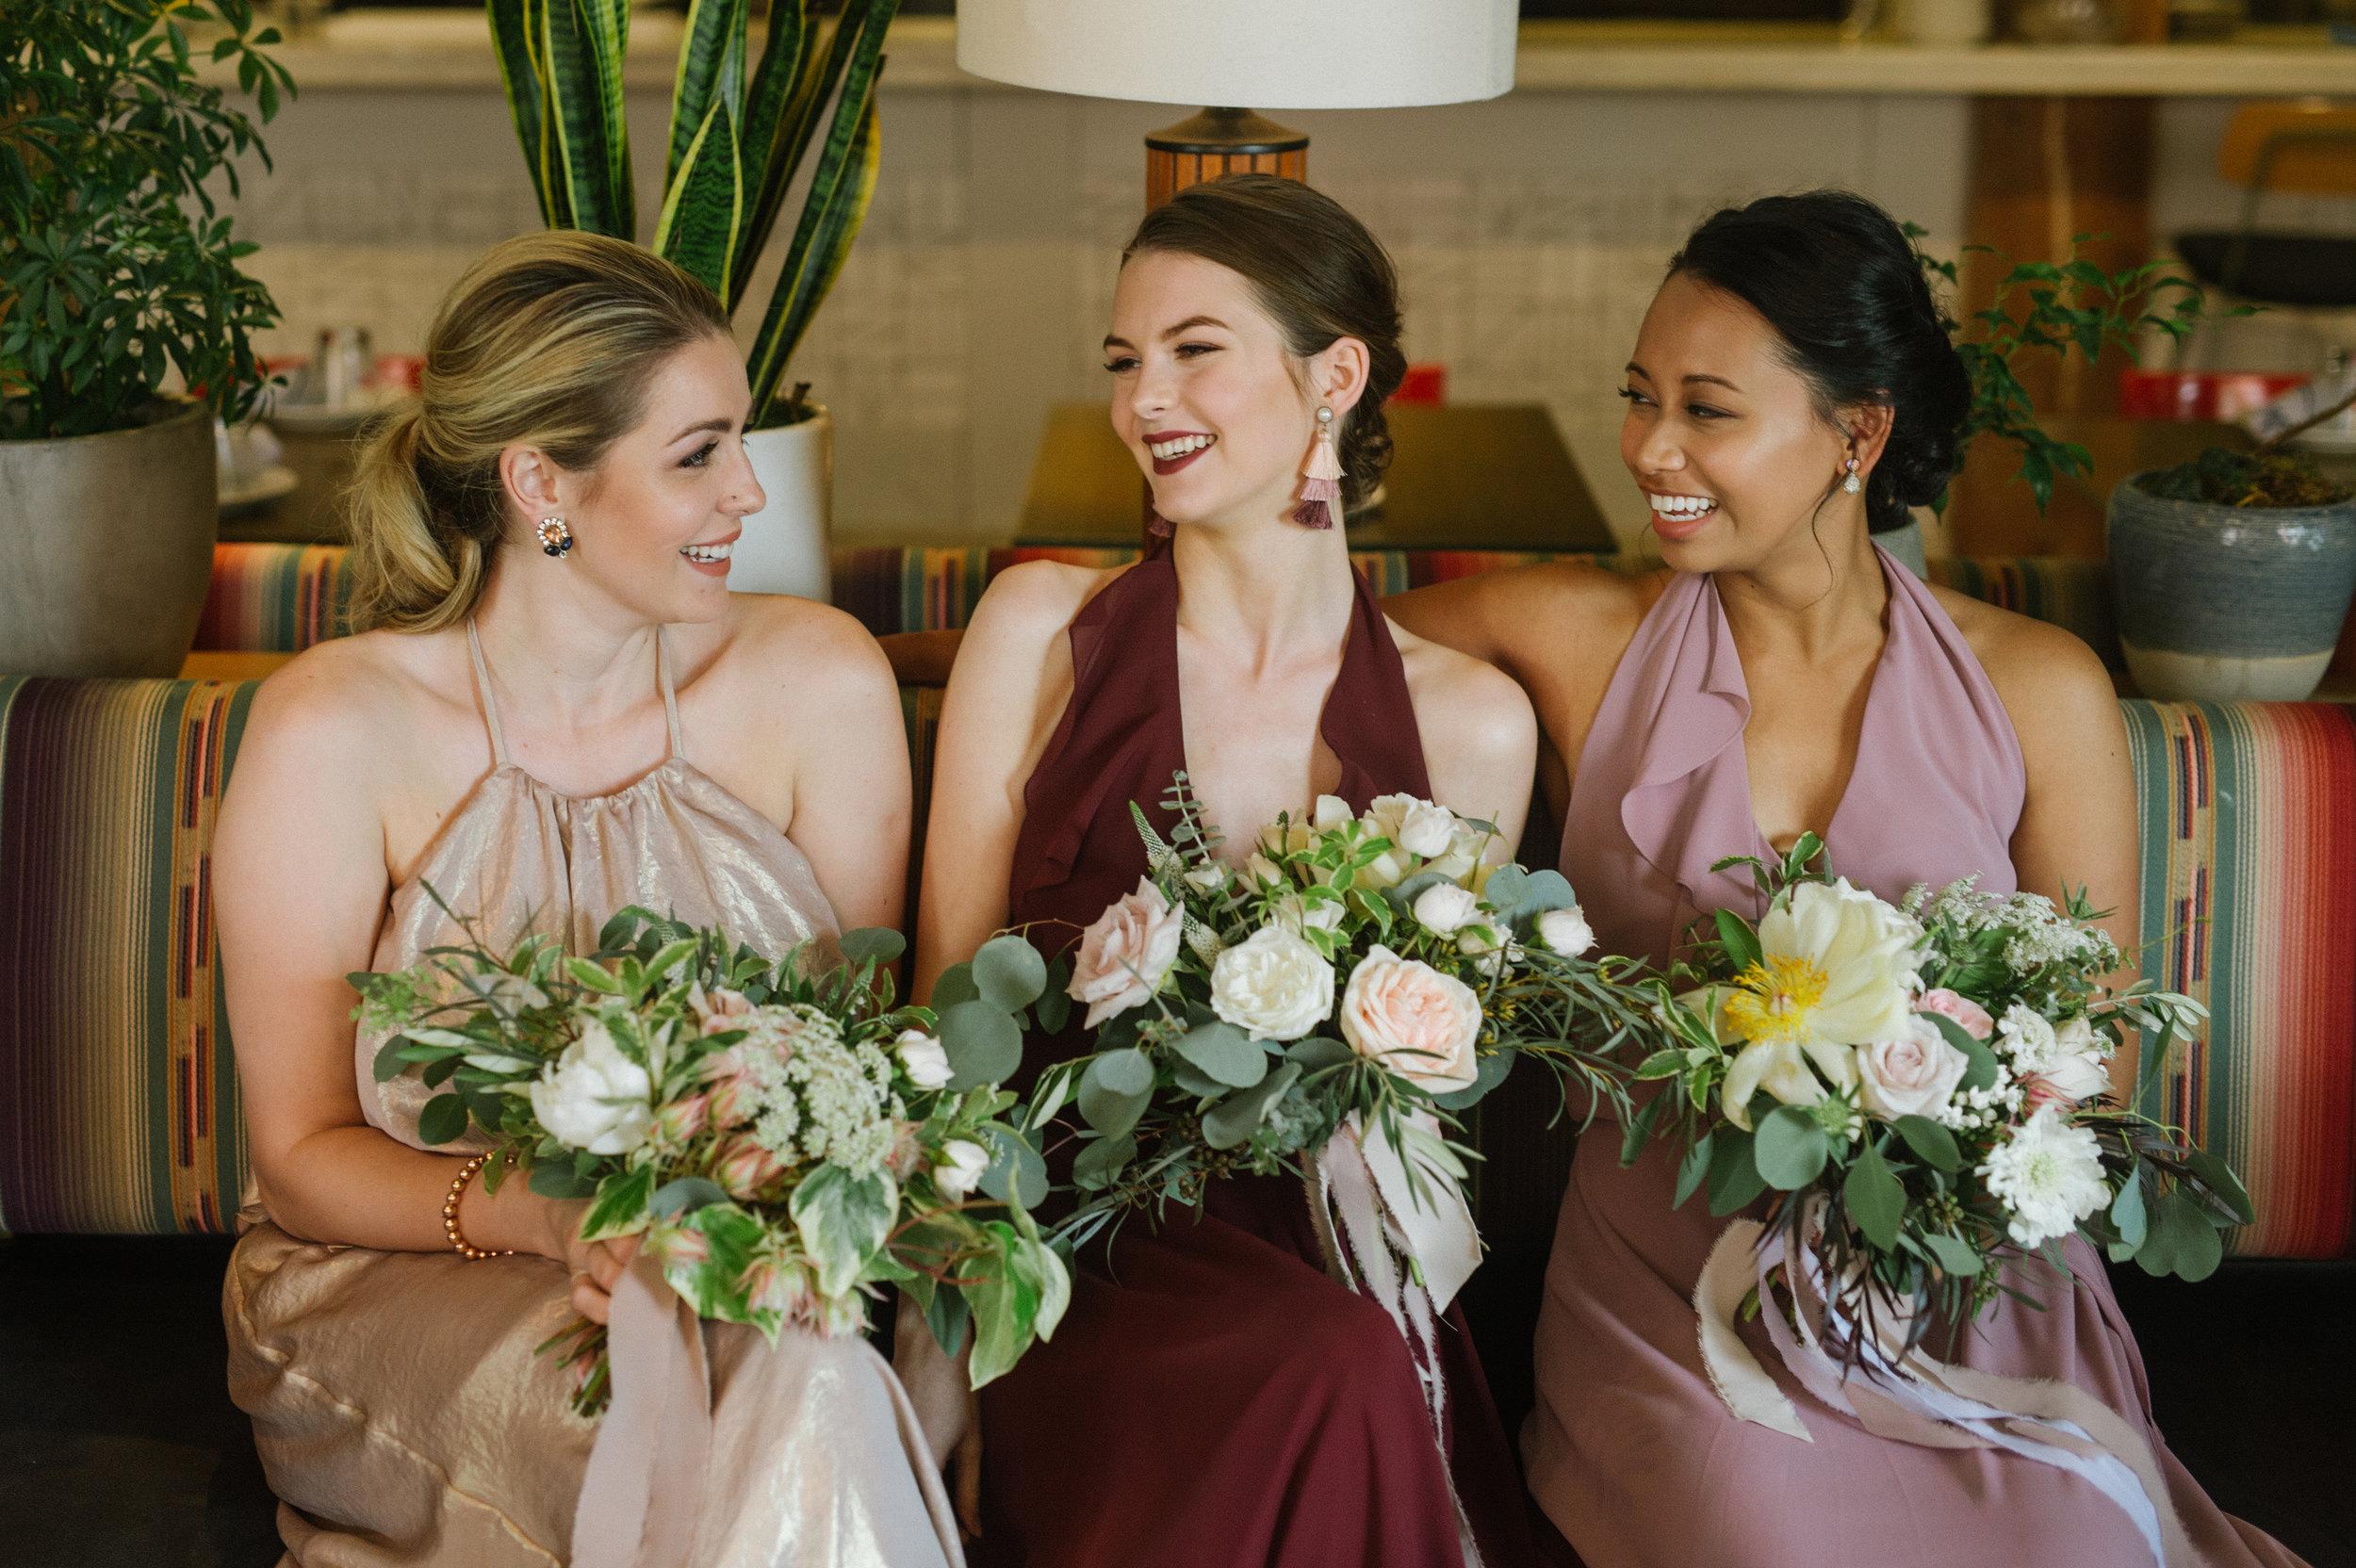 Calgary_Wedding_Photography_Bridgette_Bar_Bridesmaids_Shoot_2018_HR032.jpg